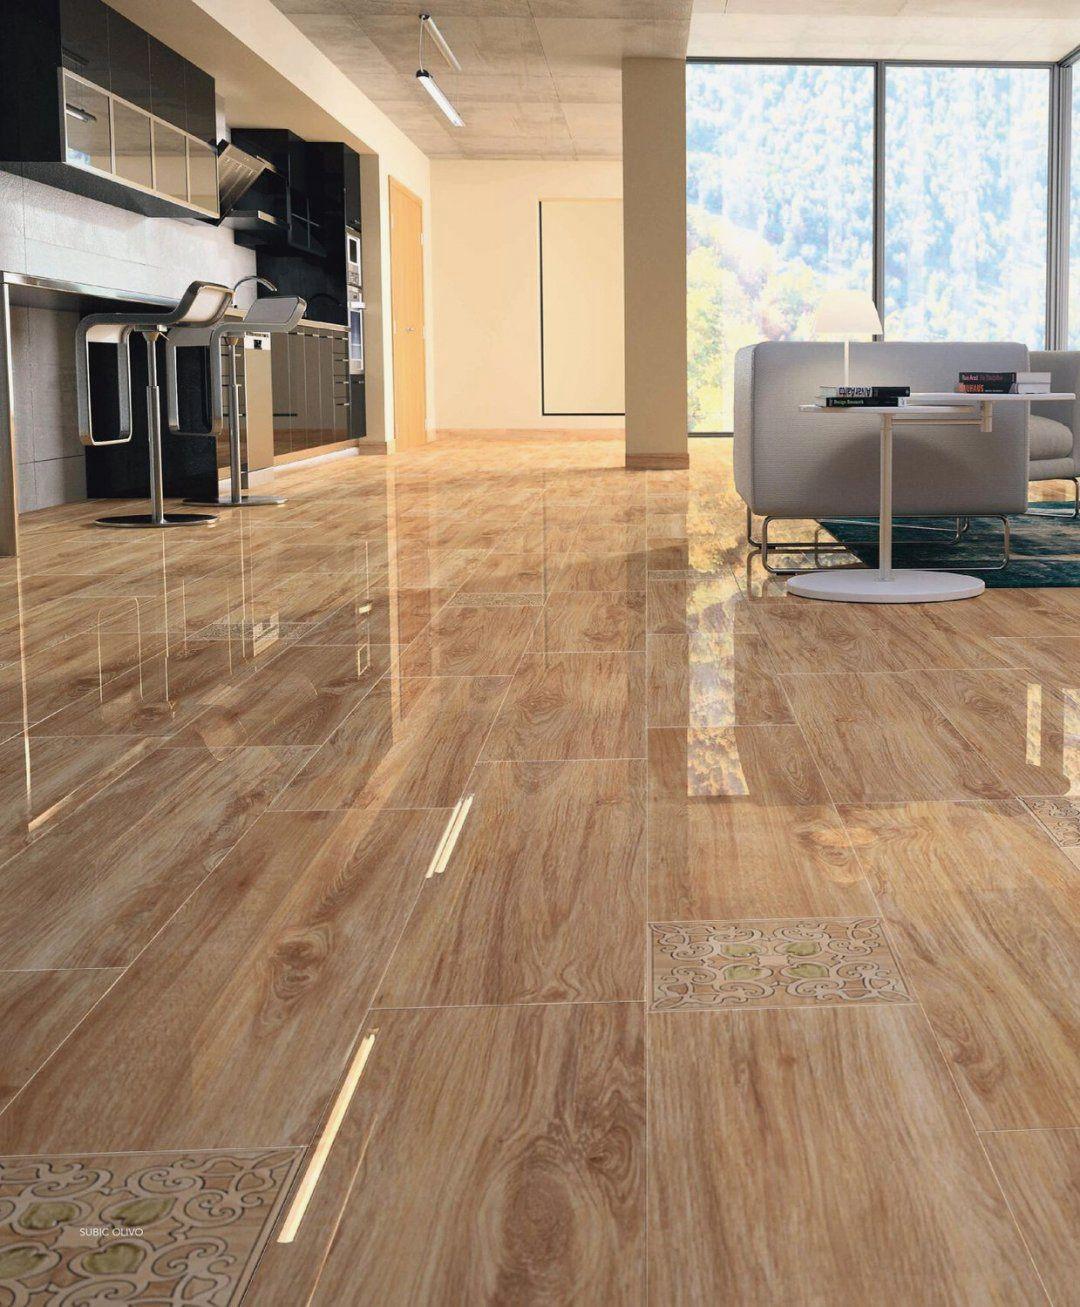 20 Floor Granite Tiles Design Philippines in 2020 | House ...